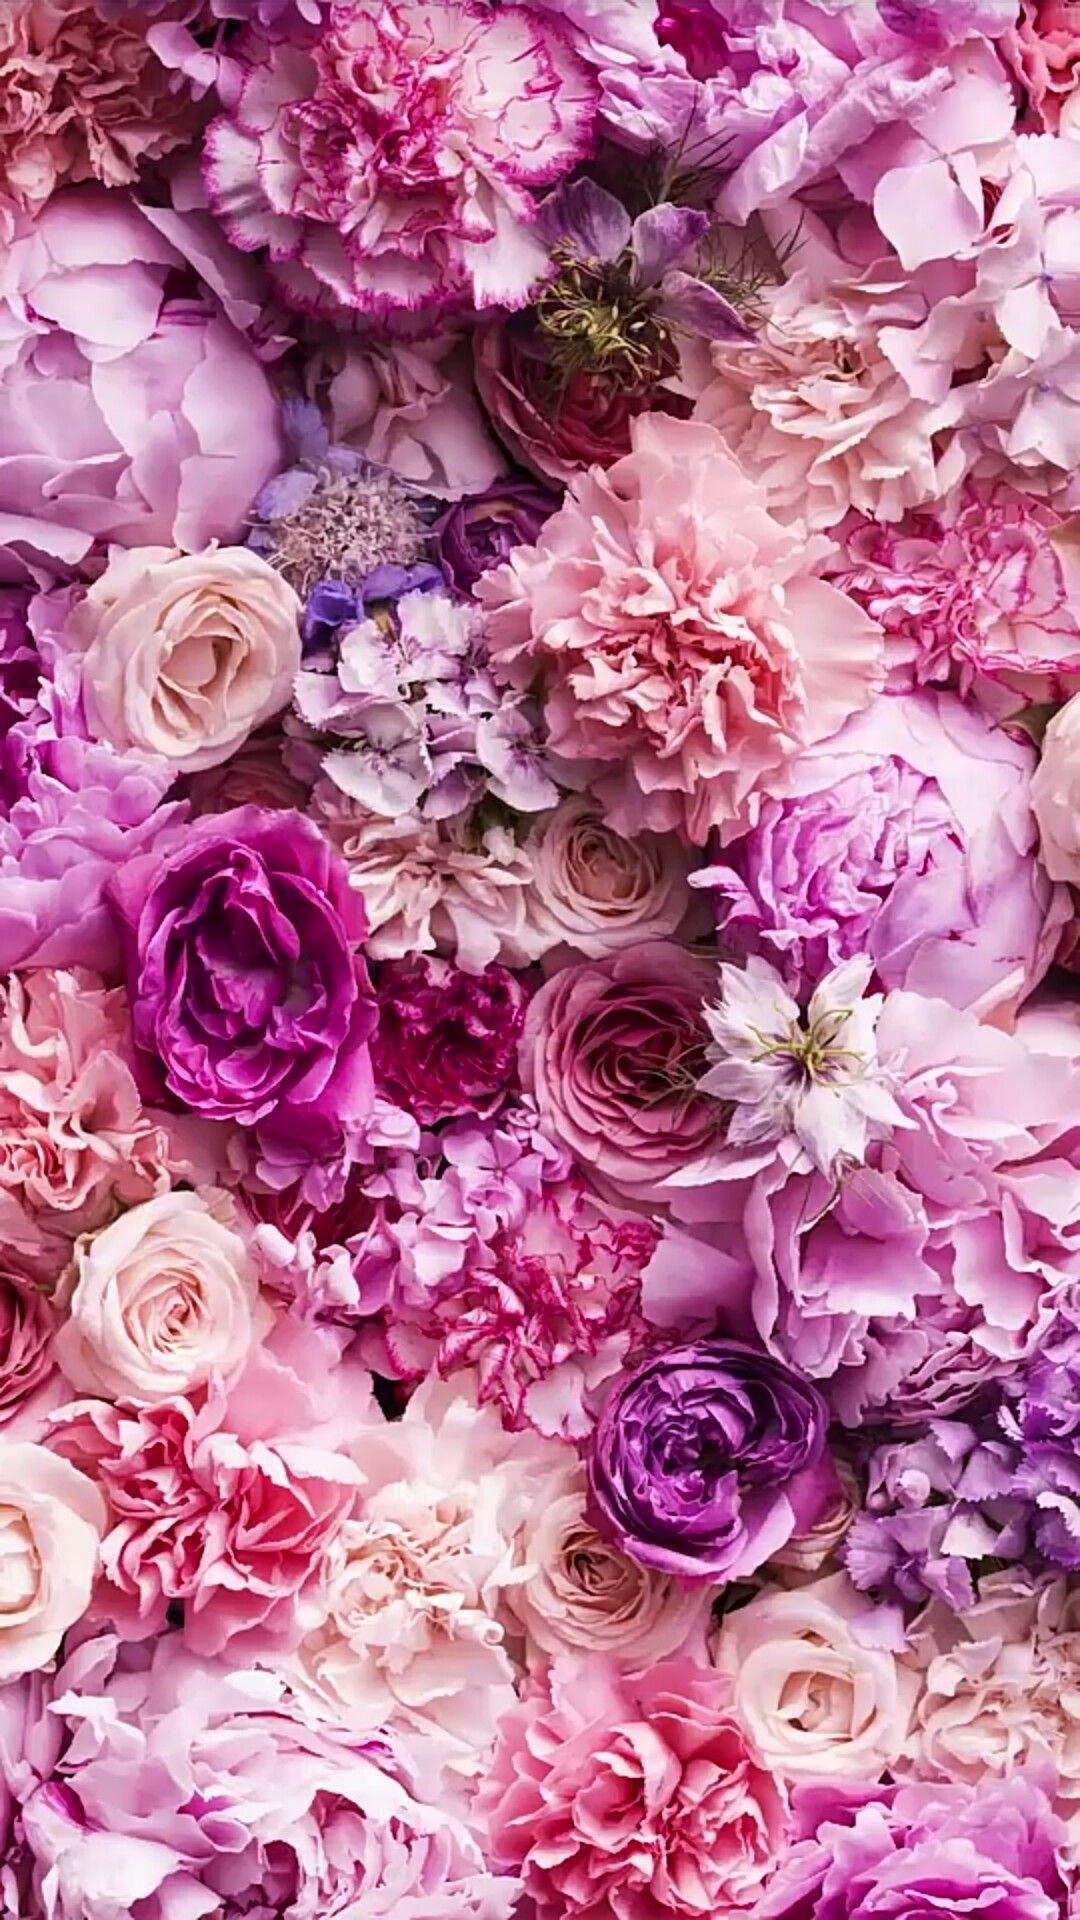 Floral ios wallpaper